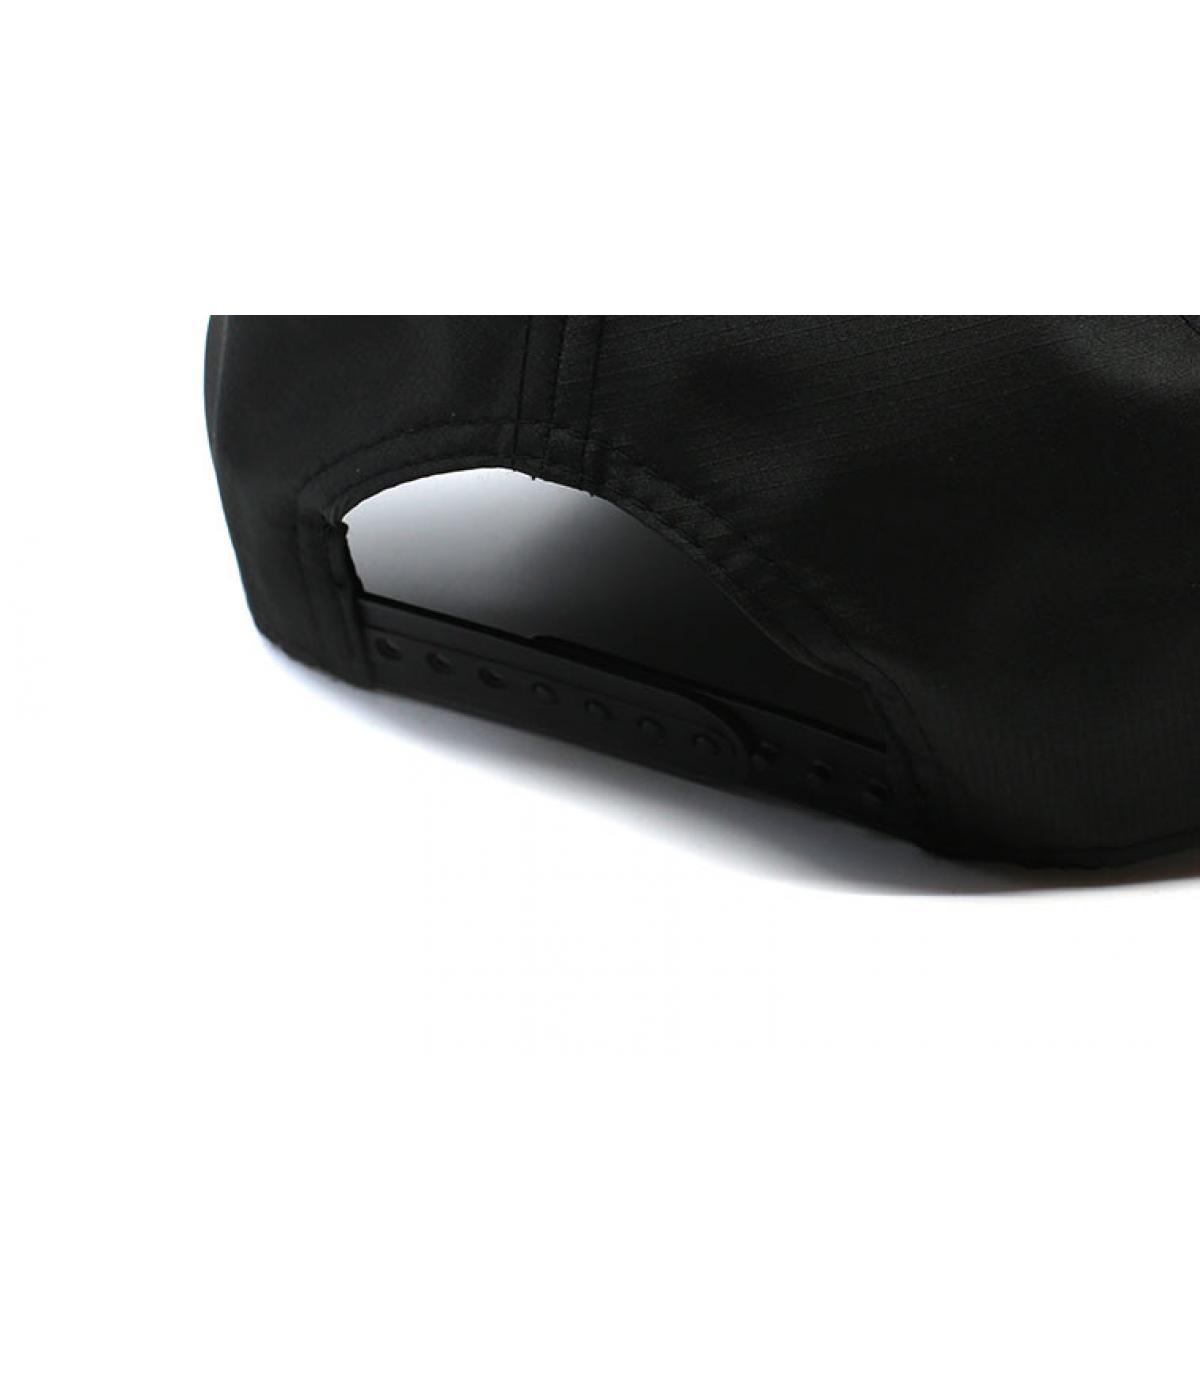 Details Ripstop LA Aframe black maroon - afbeeling 5